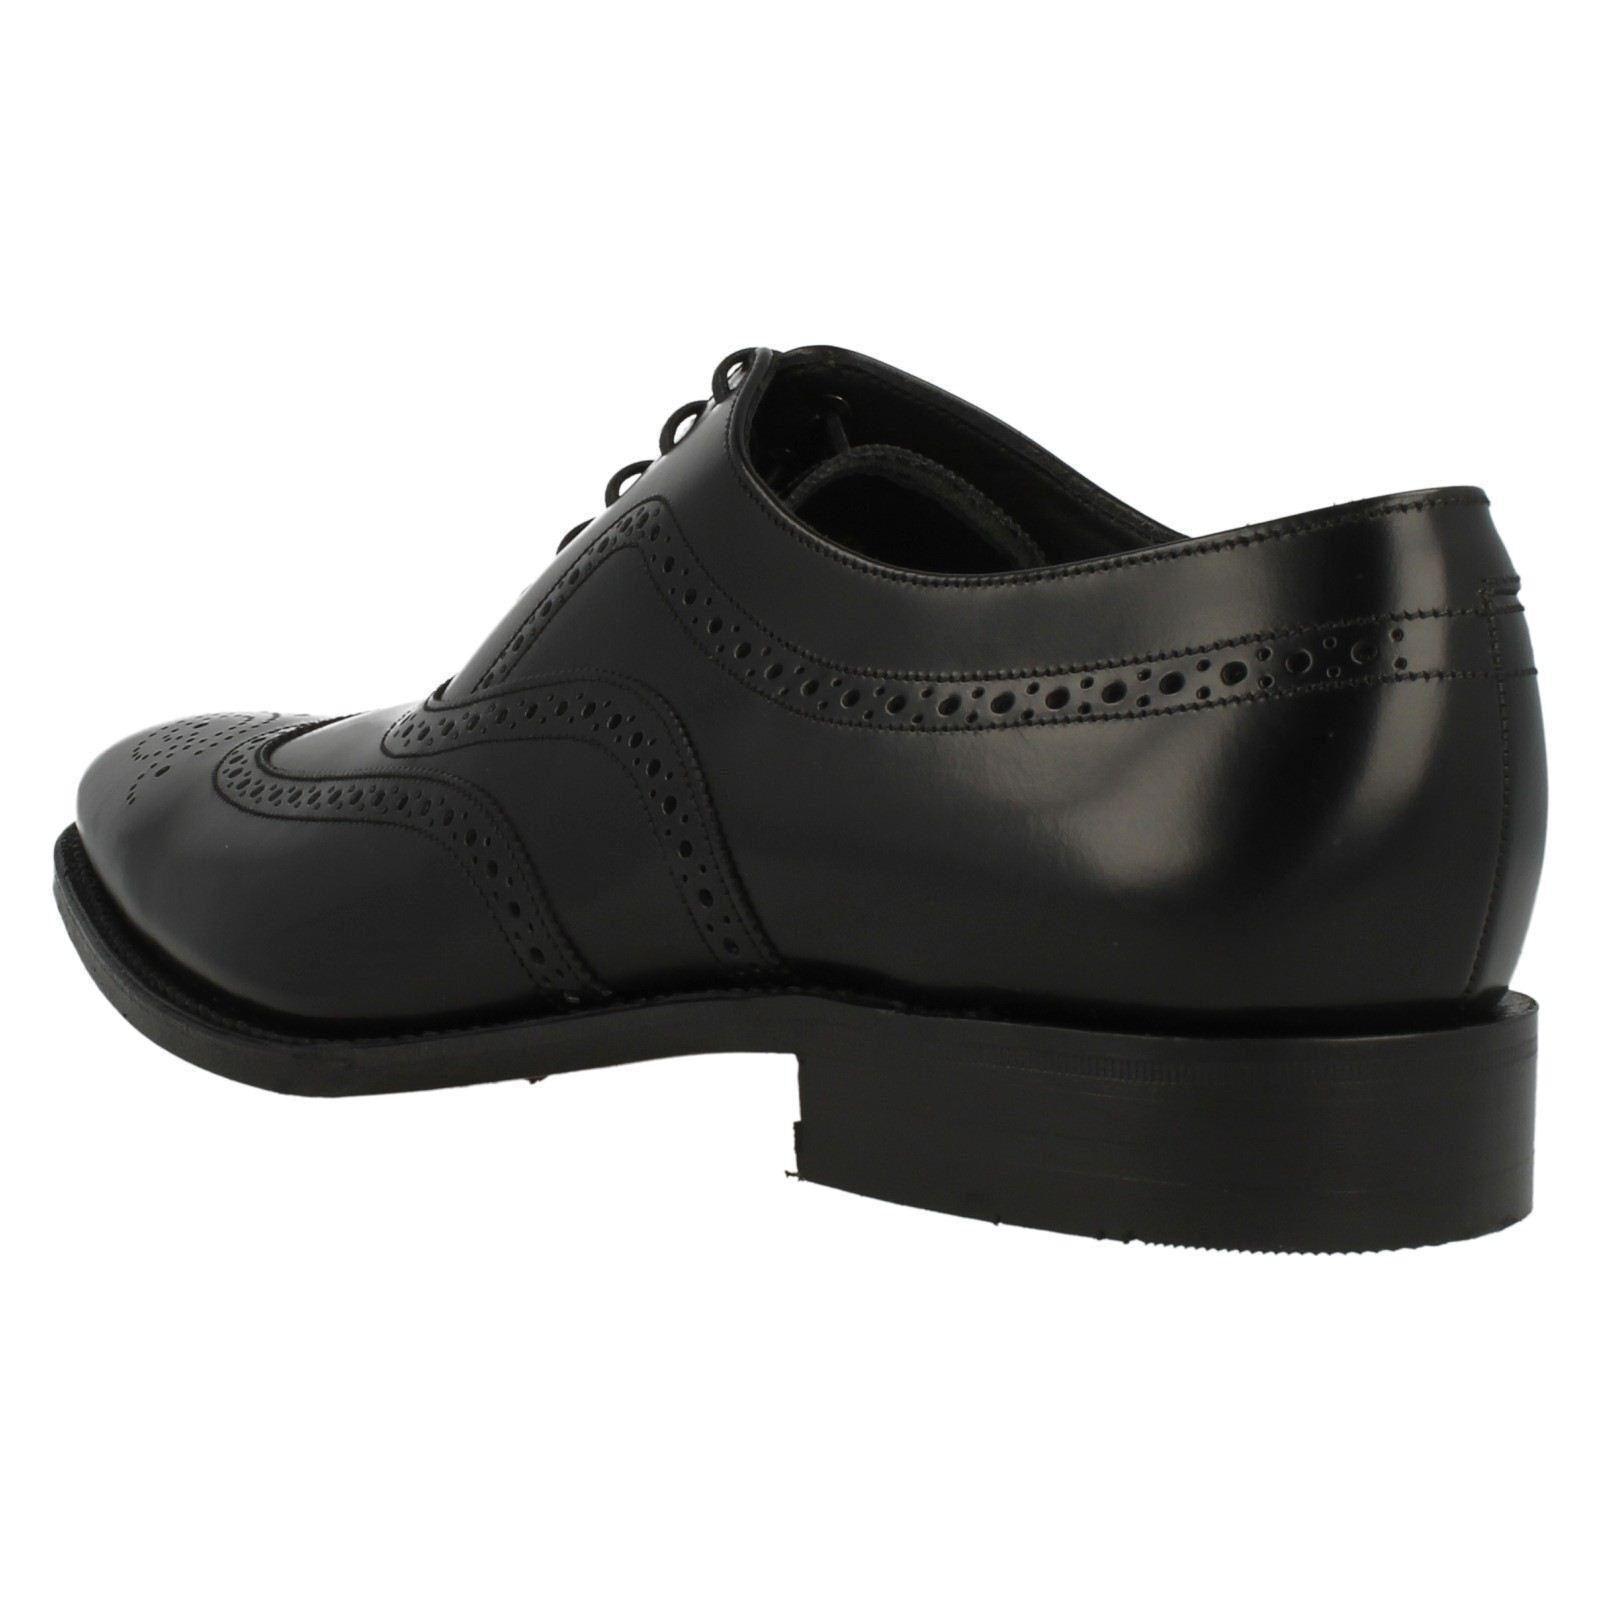 Loake Smart Jones Gents schwarz Formal Smart Loake Schuhes 101d19